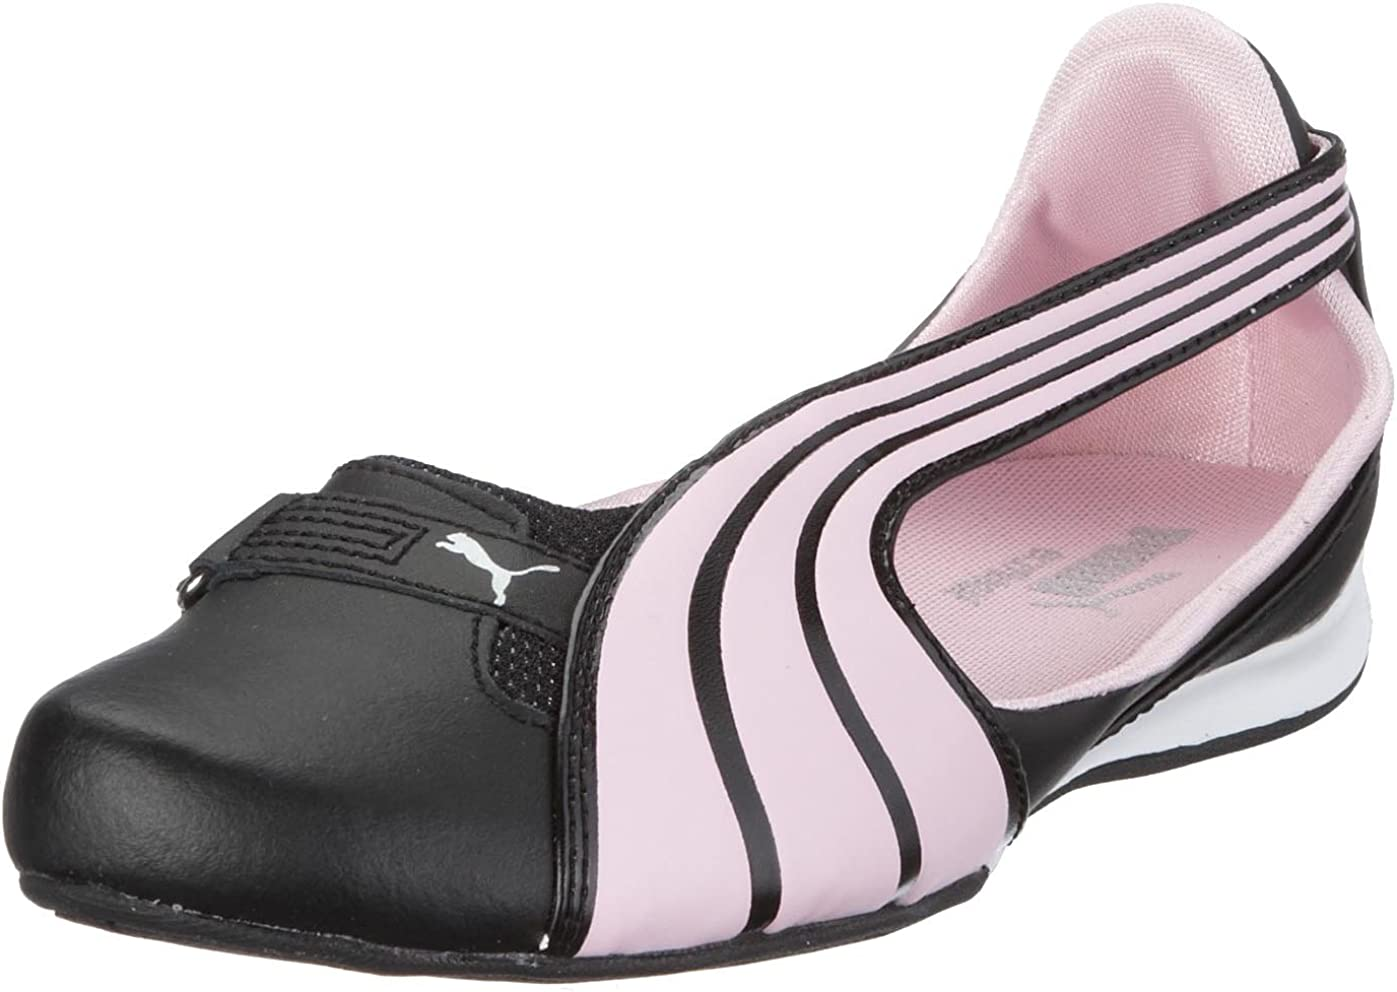 hoja caligrafía lado  Puma Espera III L Jr Ballet Flats Girls Black Schwarz (black-pink  lady-black 02) Size: 11 (29 EU): Amazon.co.uk: Shoes & Bags